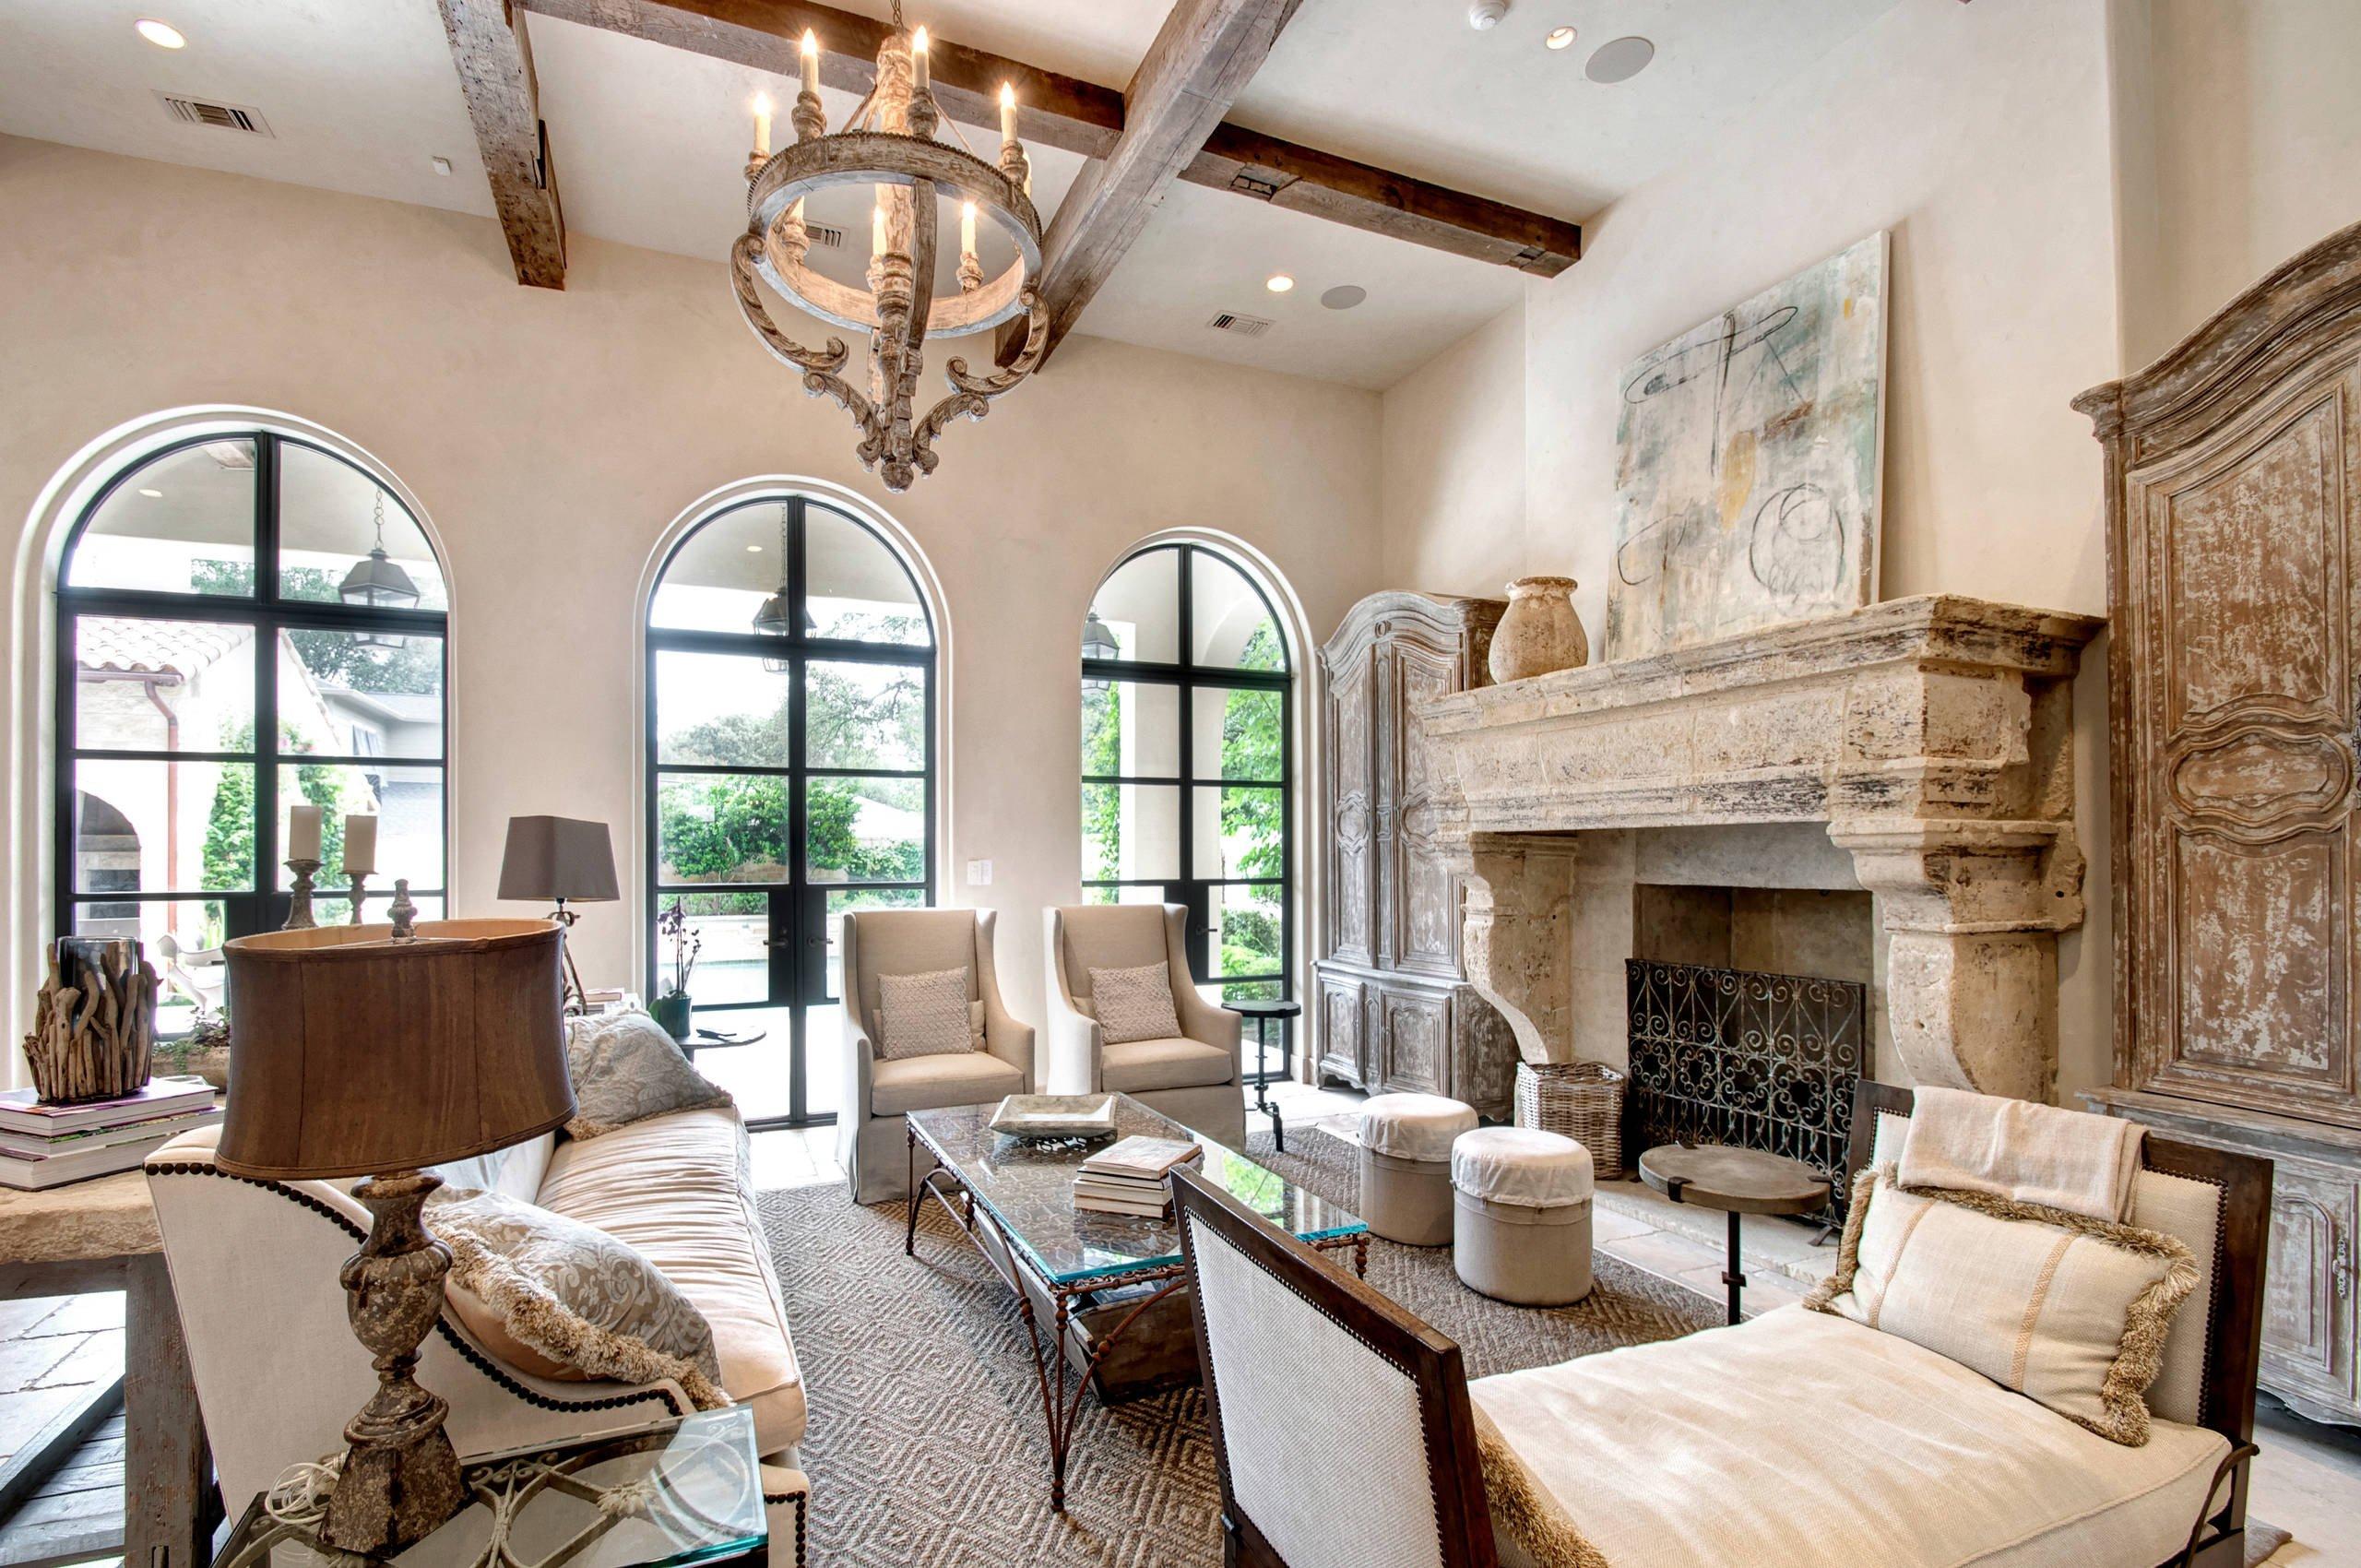 Modern Mediterranean Living Room Decorating Ideas 15 Beautiful Mediterranean Living Room Designs You Ll Love